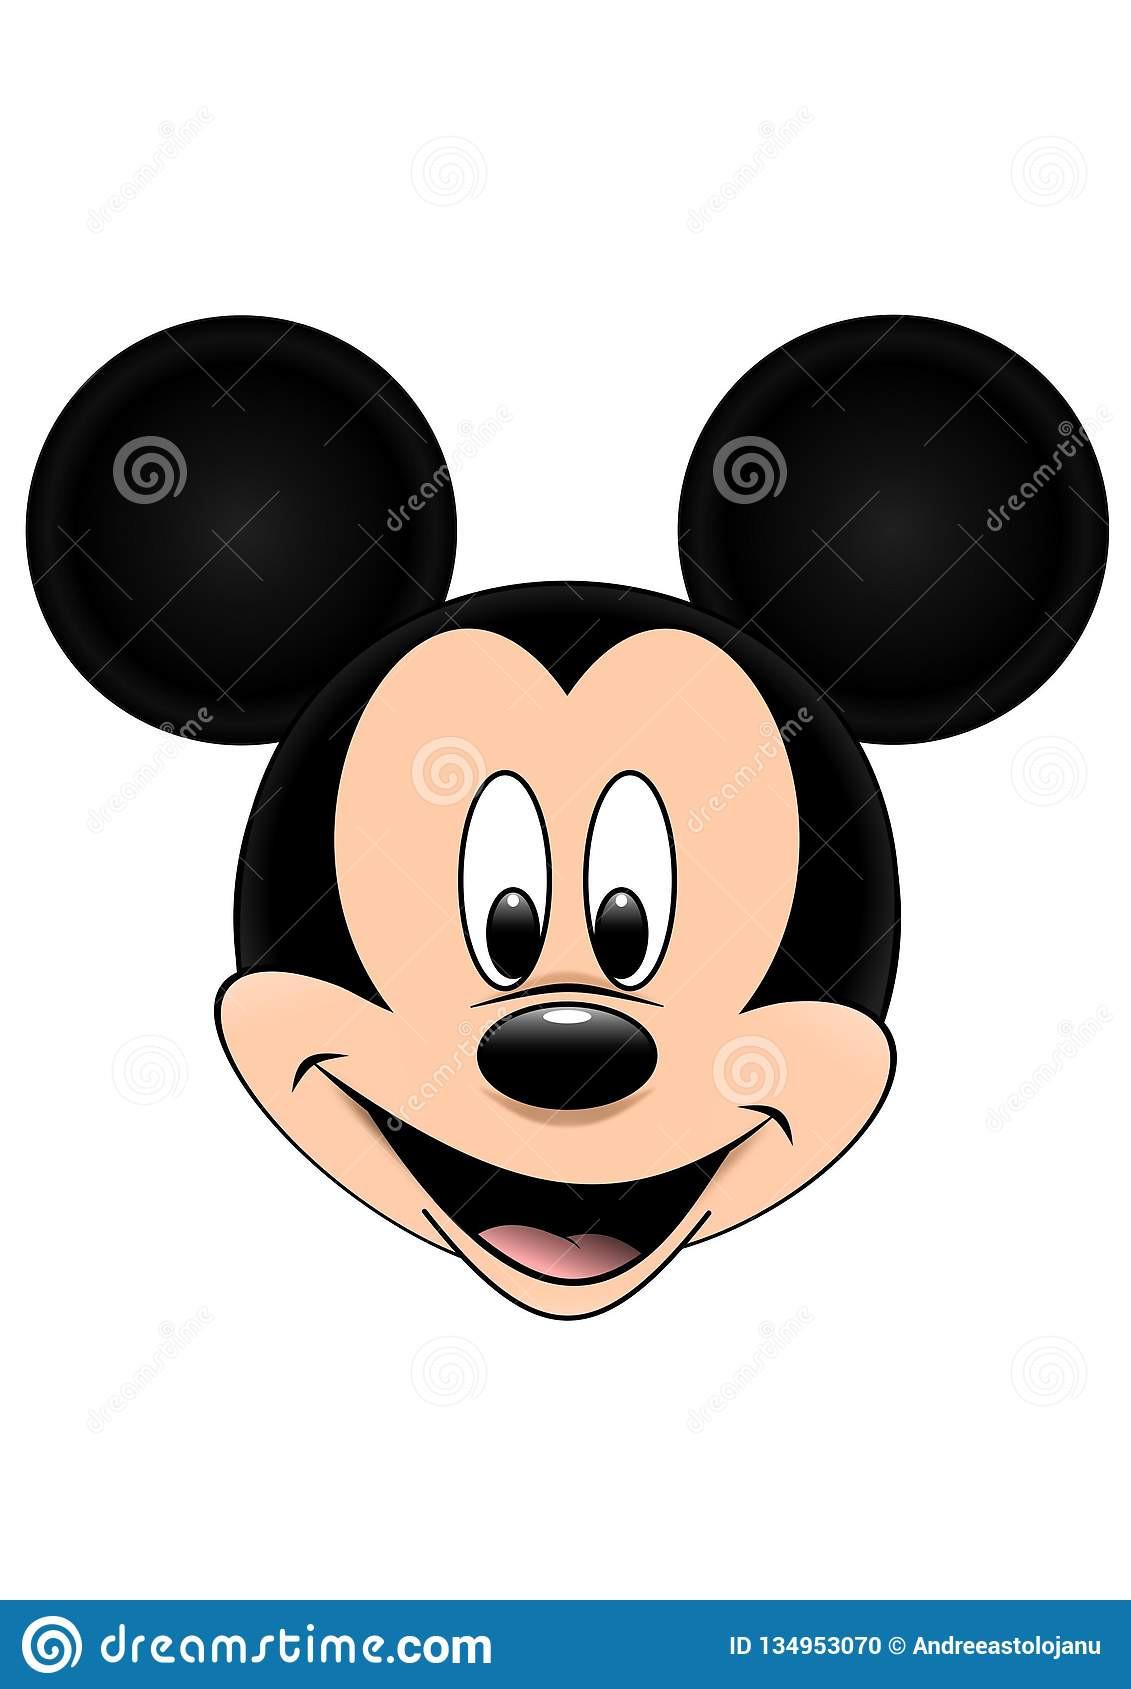 Quelle chanson Disney es-tu (1) ?